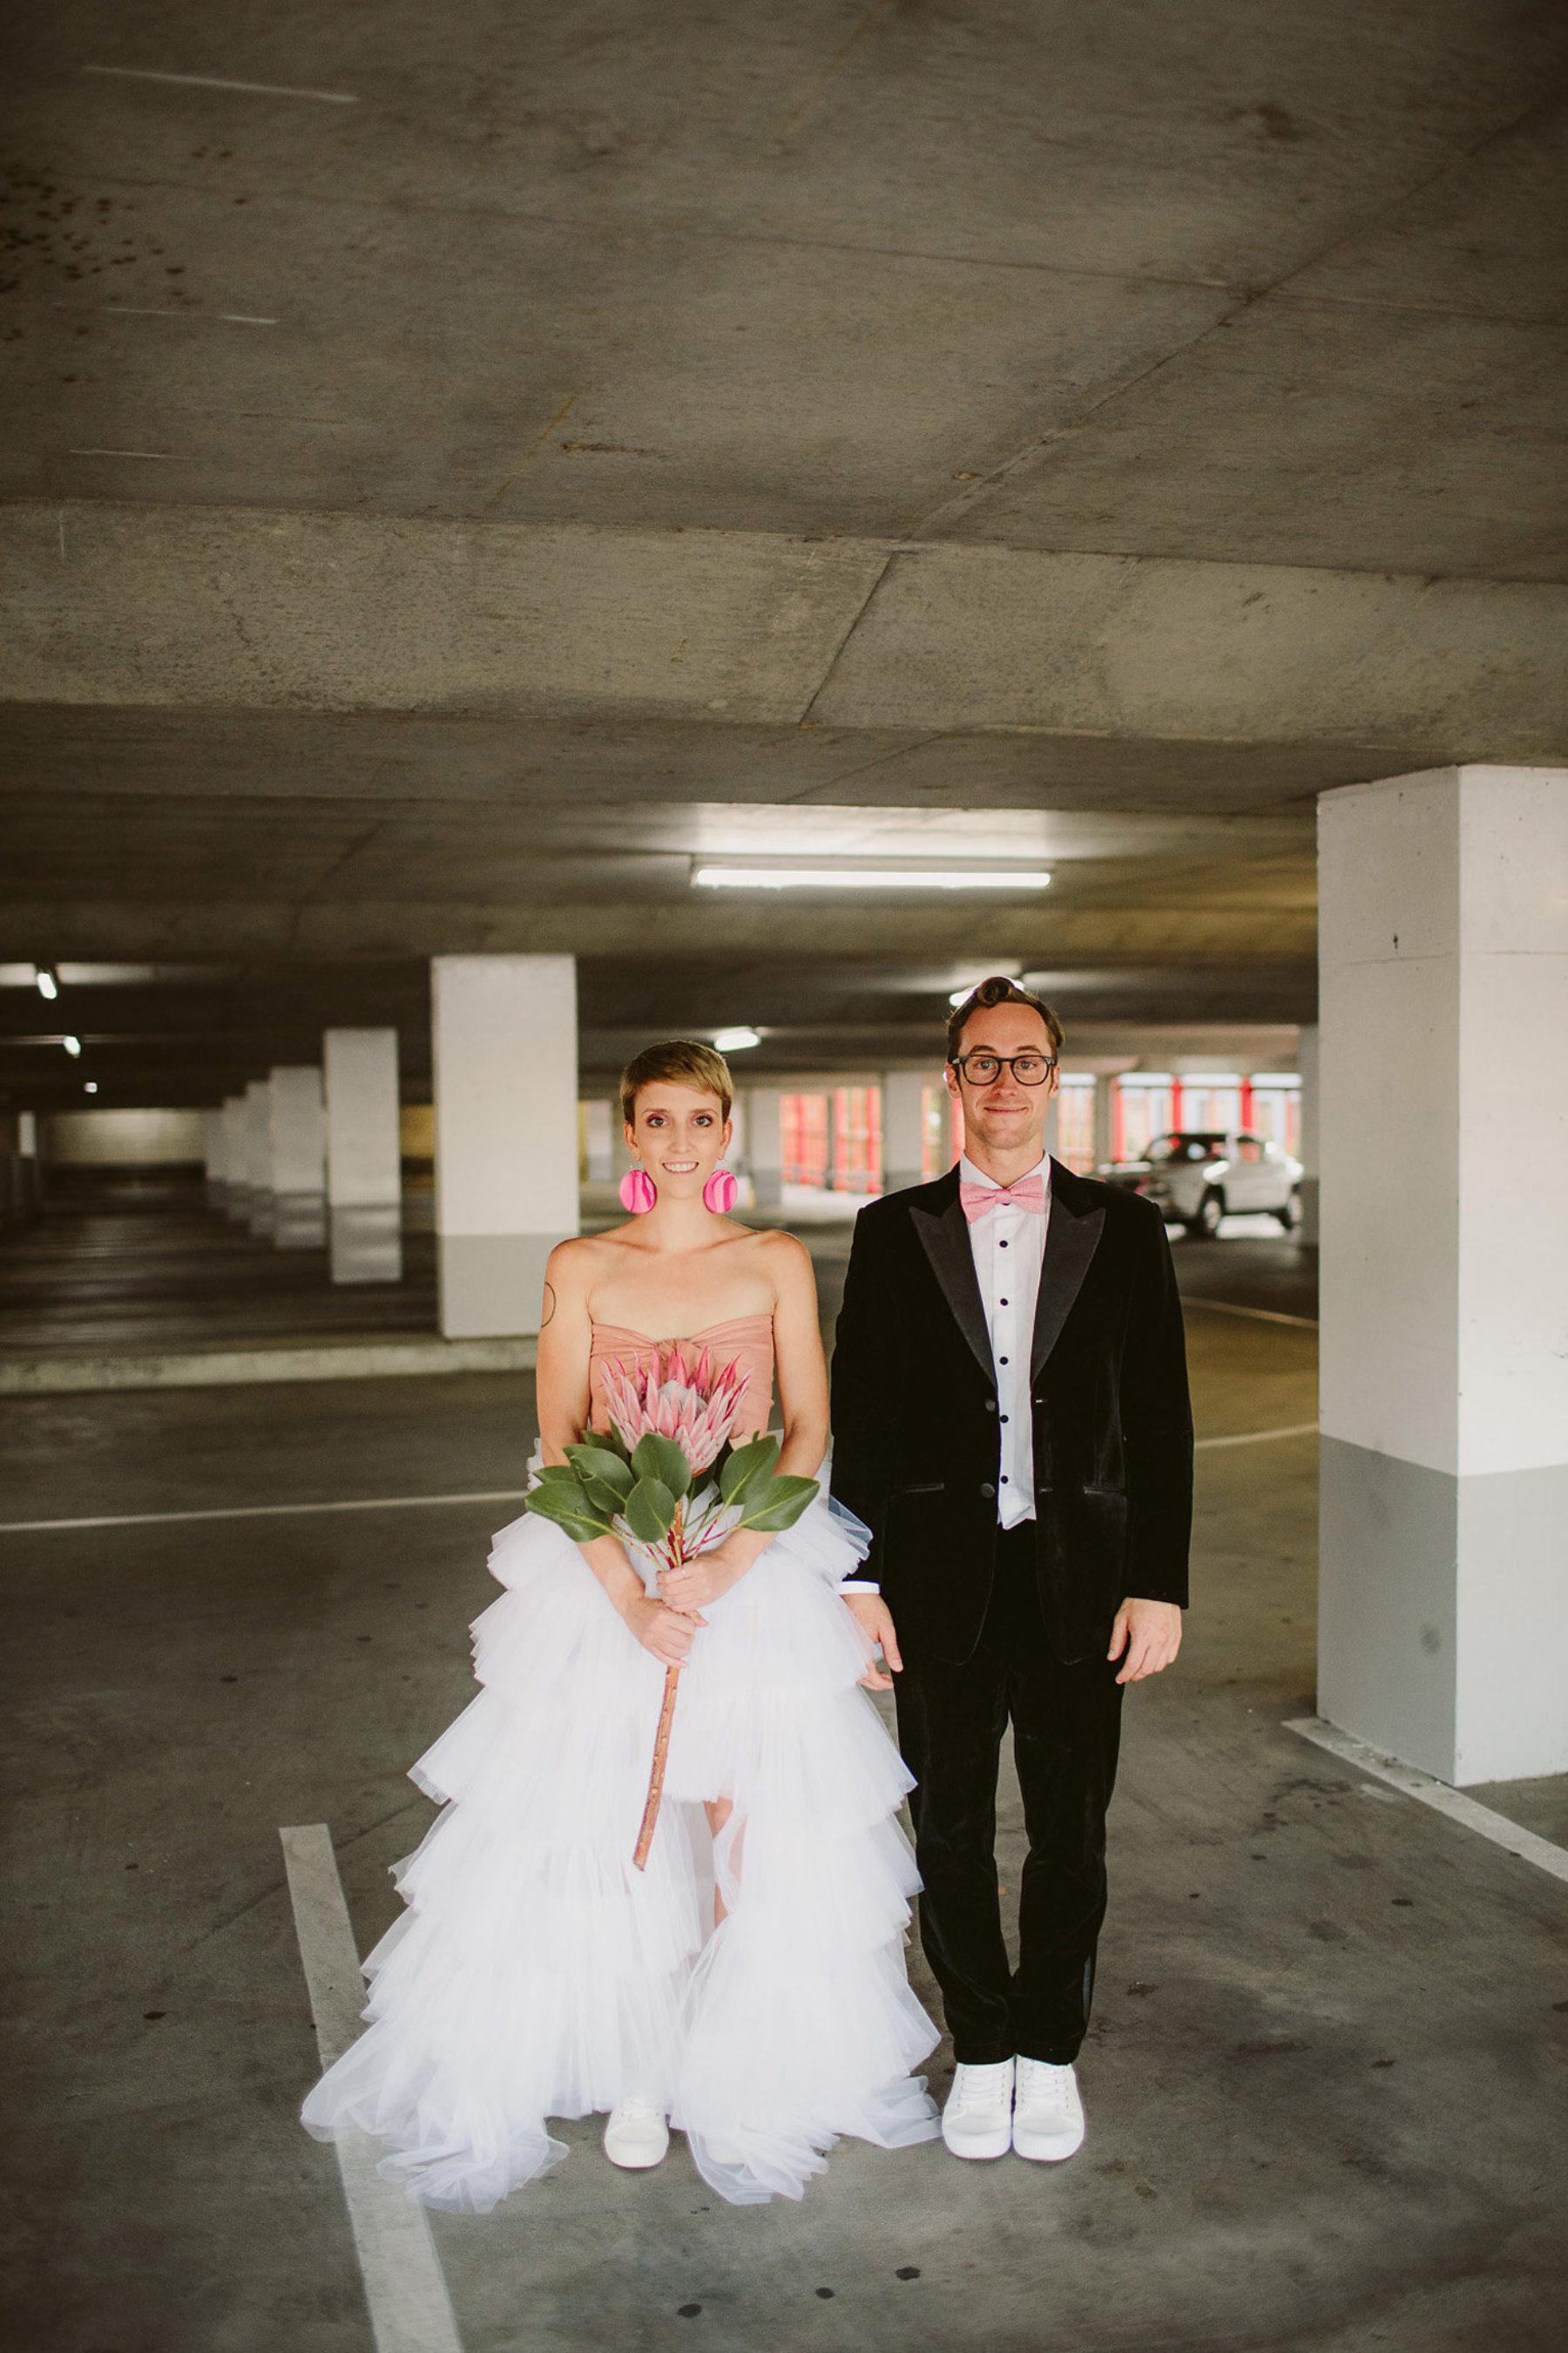 adelaide-warehouse-party-wedding-27-1800x0-c-default.jpg